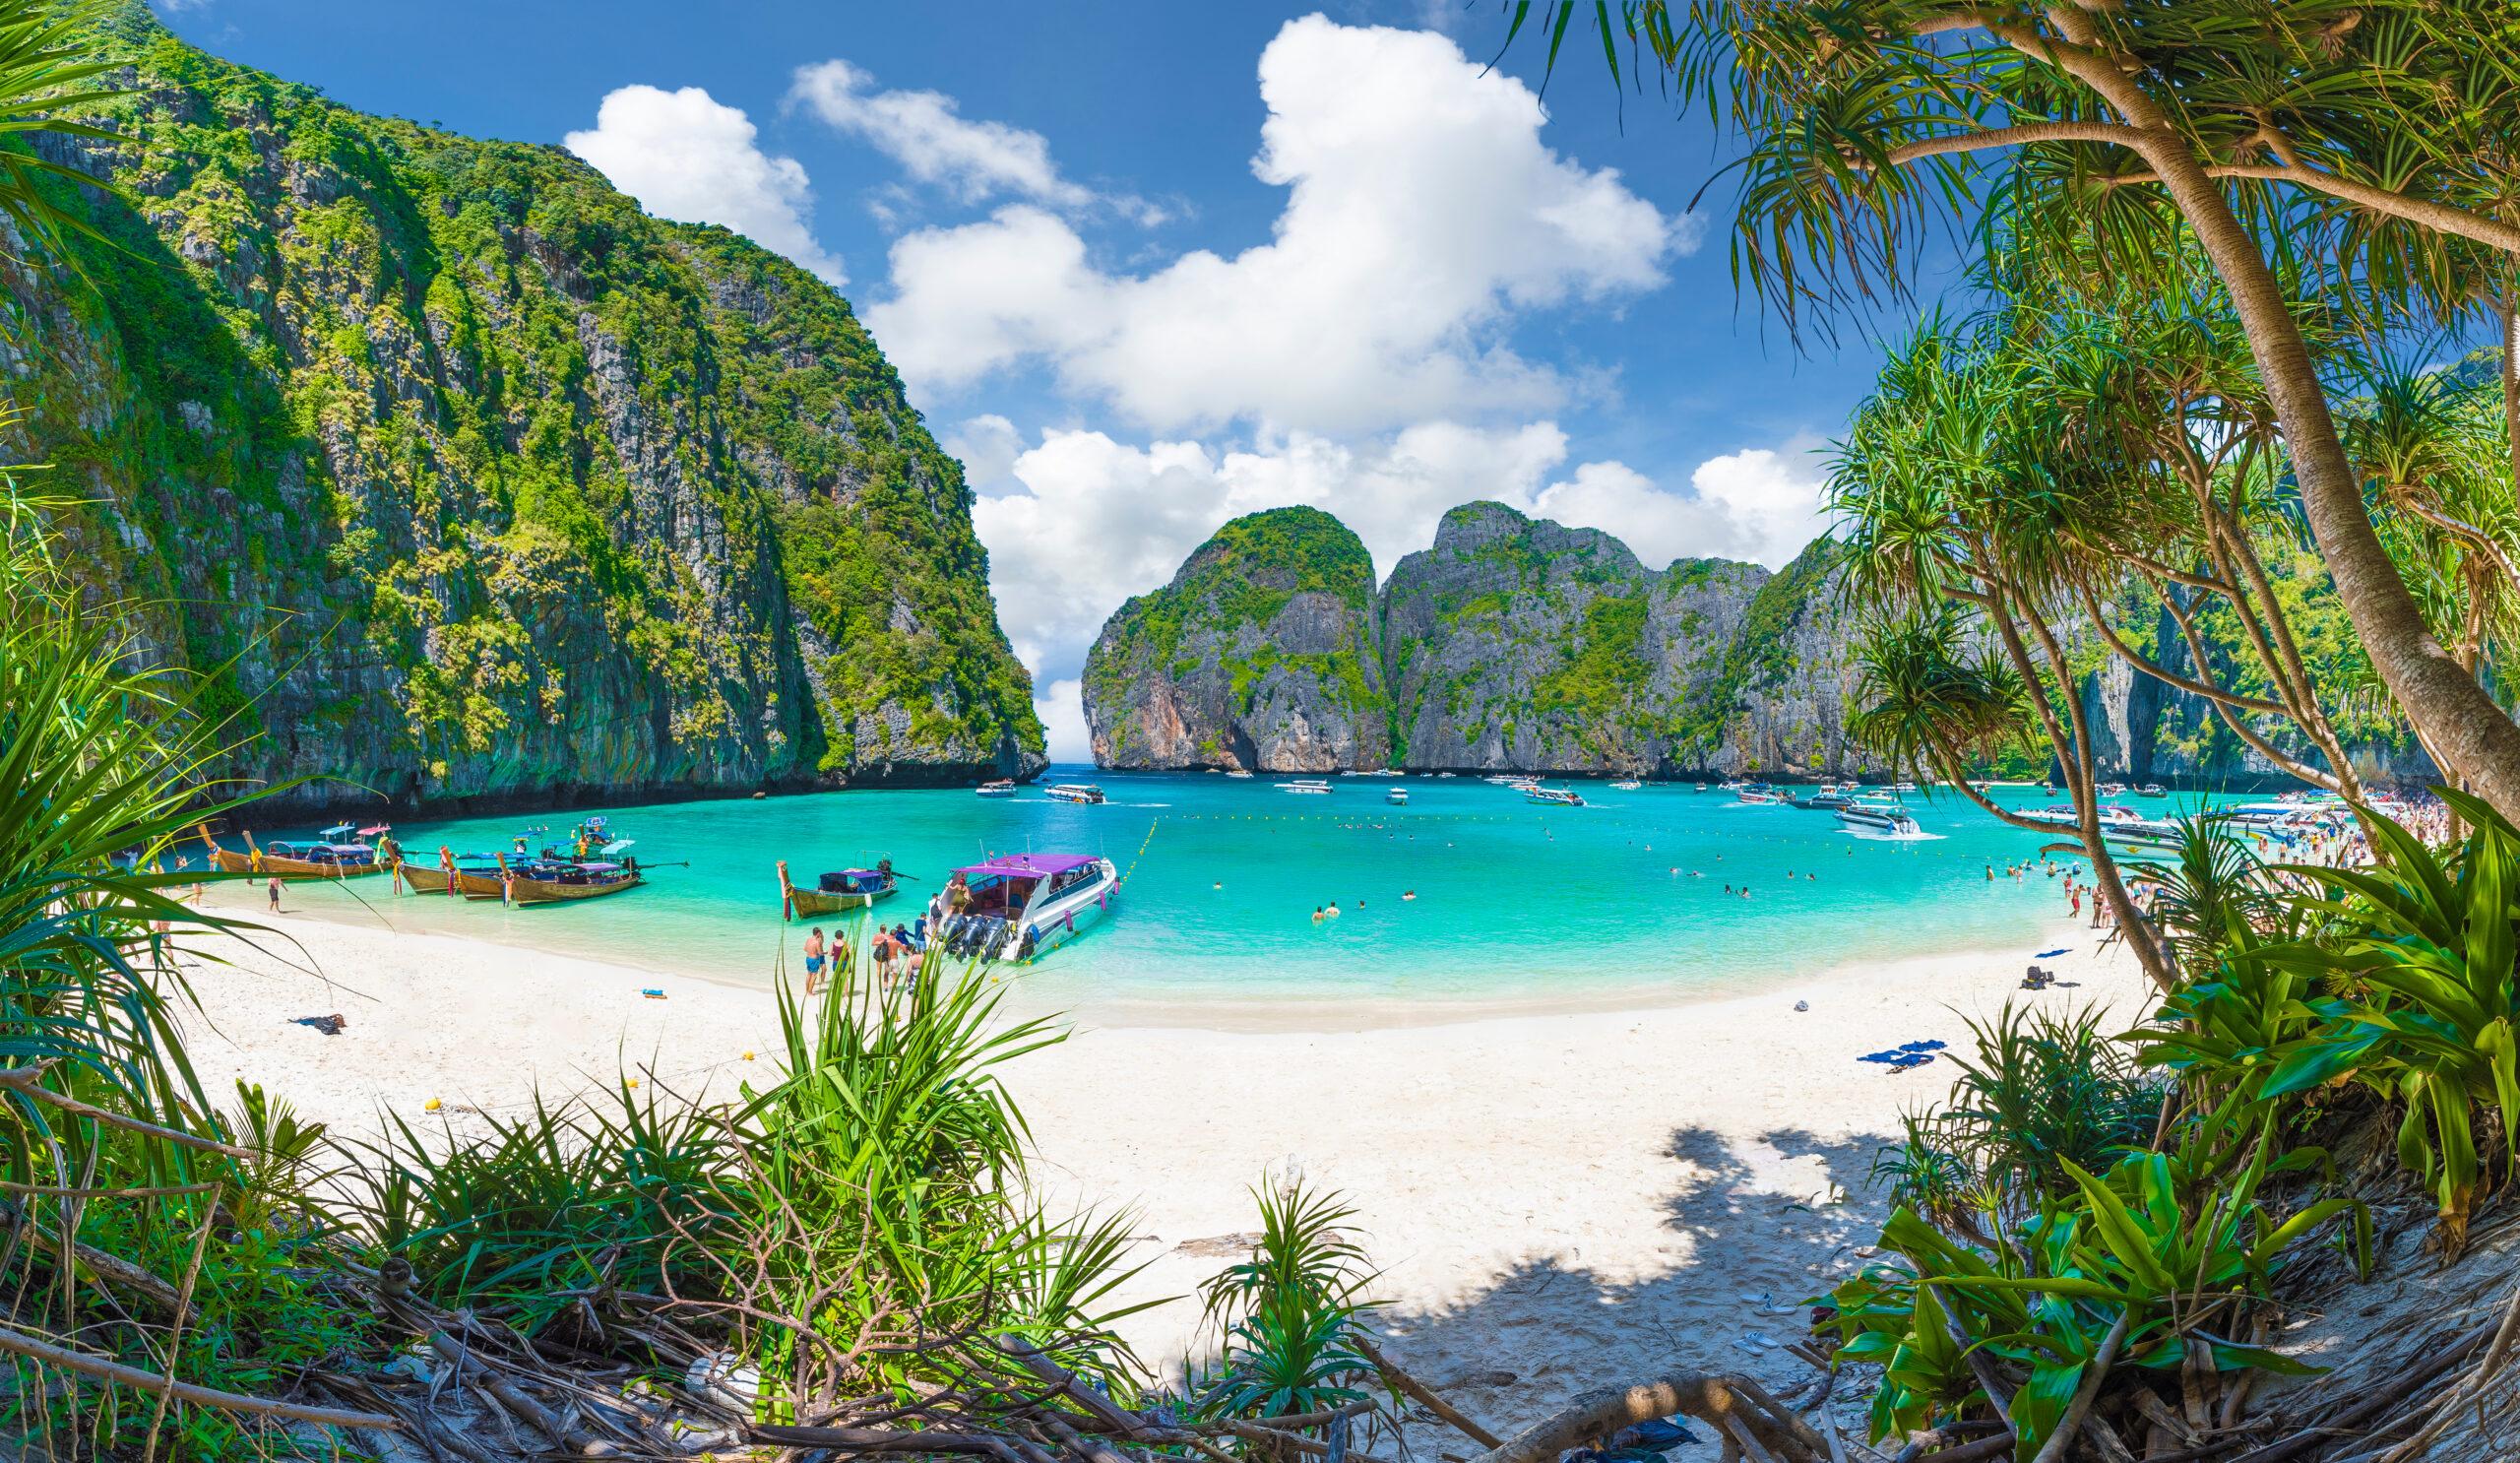 Maya Bay Phi Phi Islands, Thailand